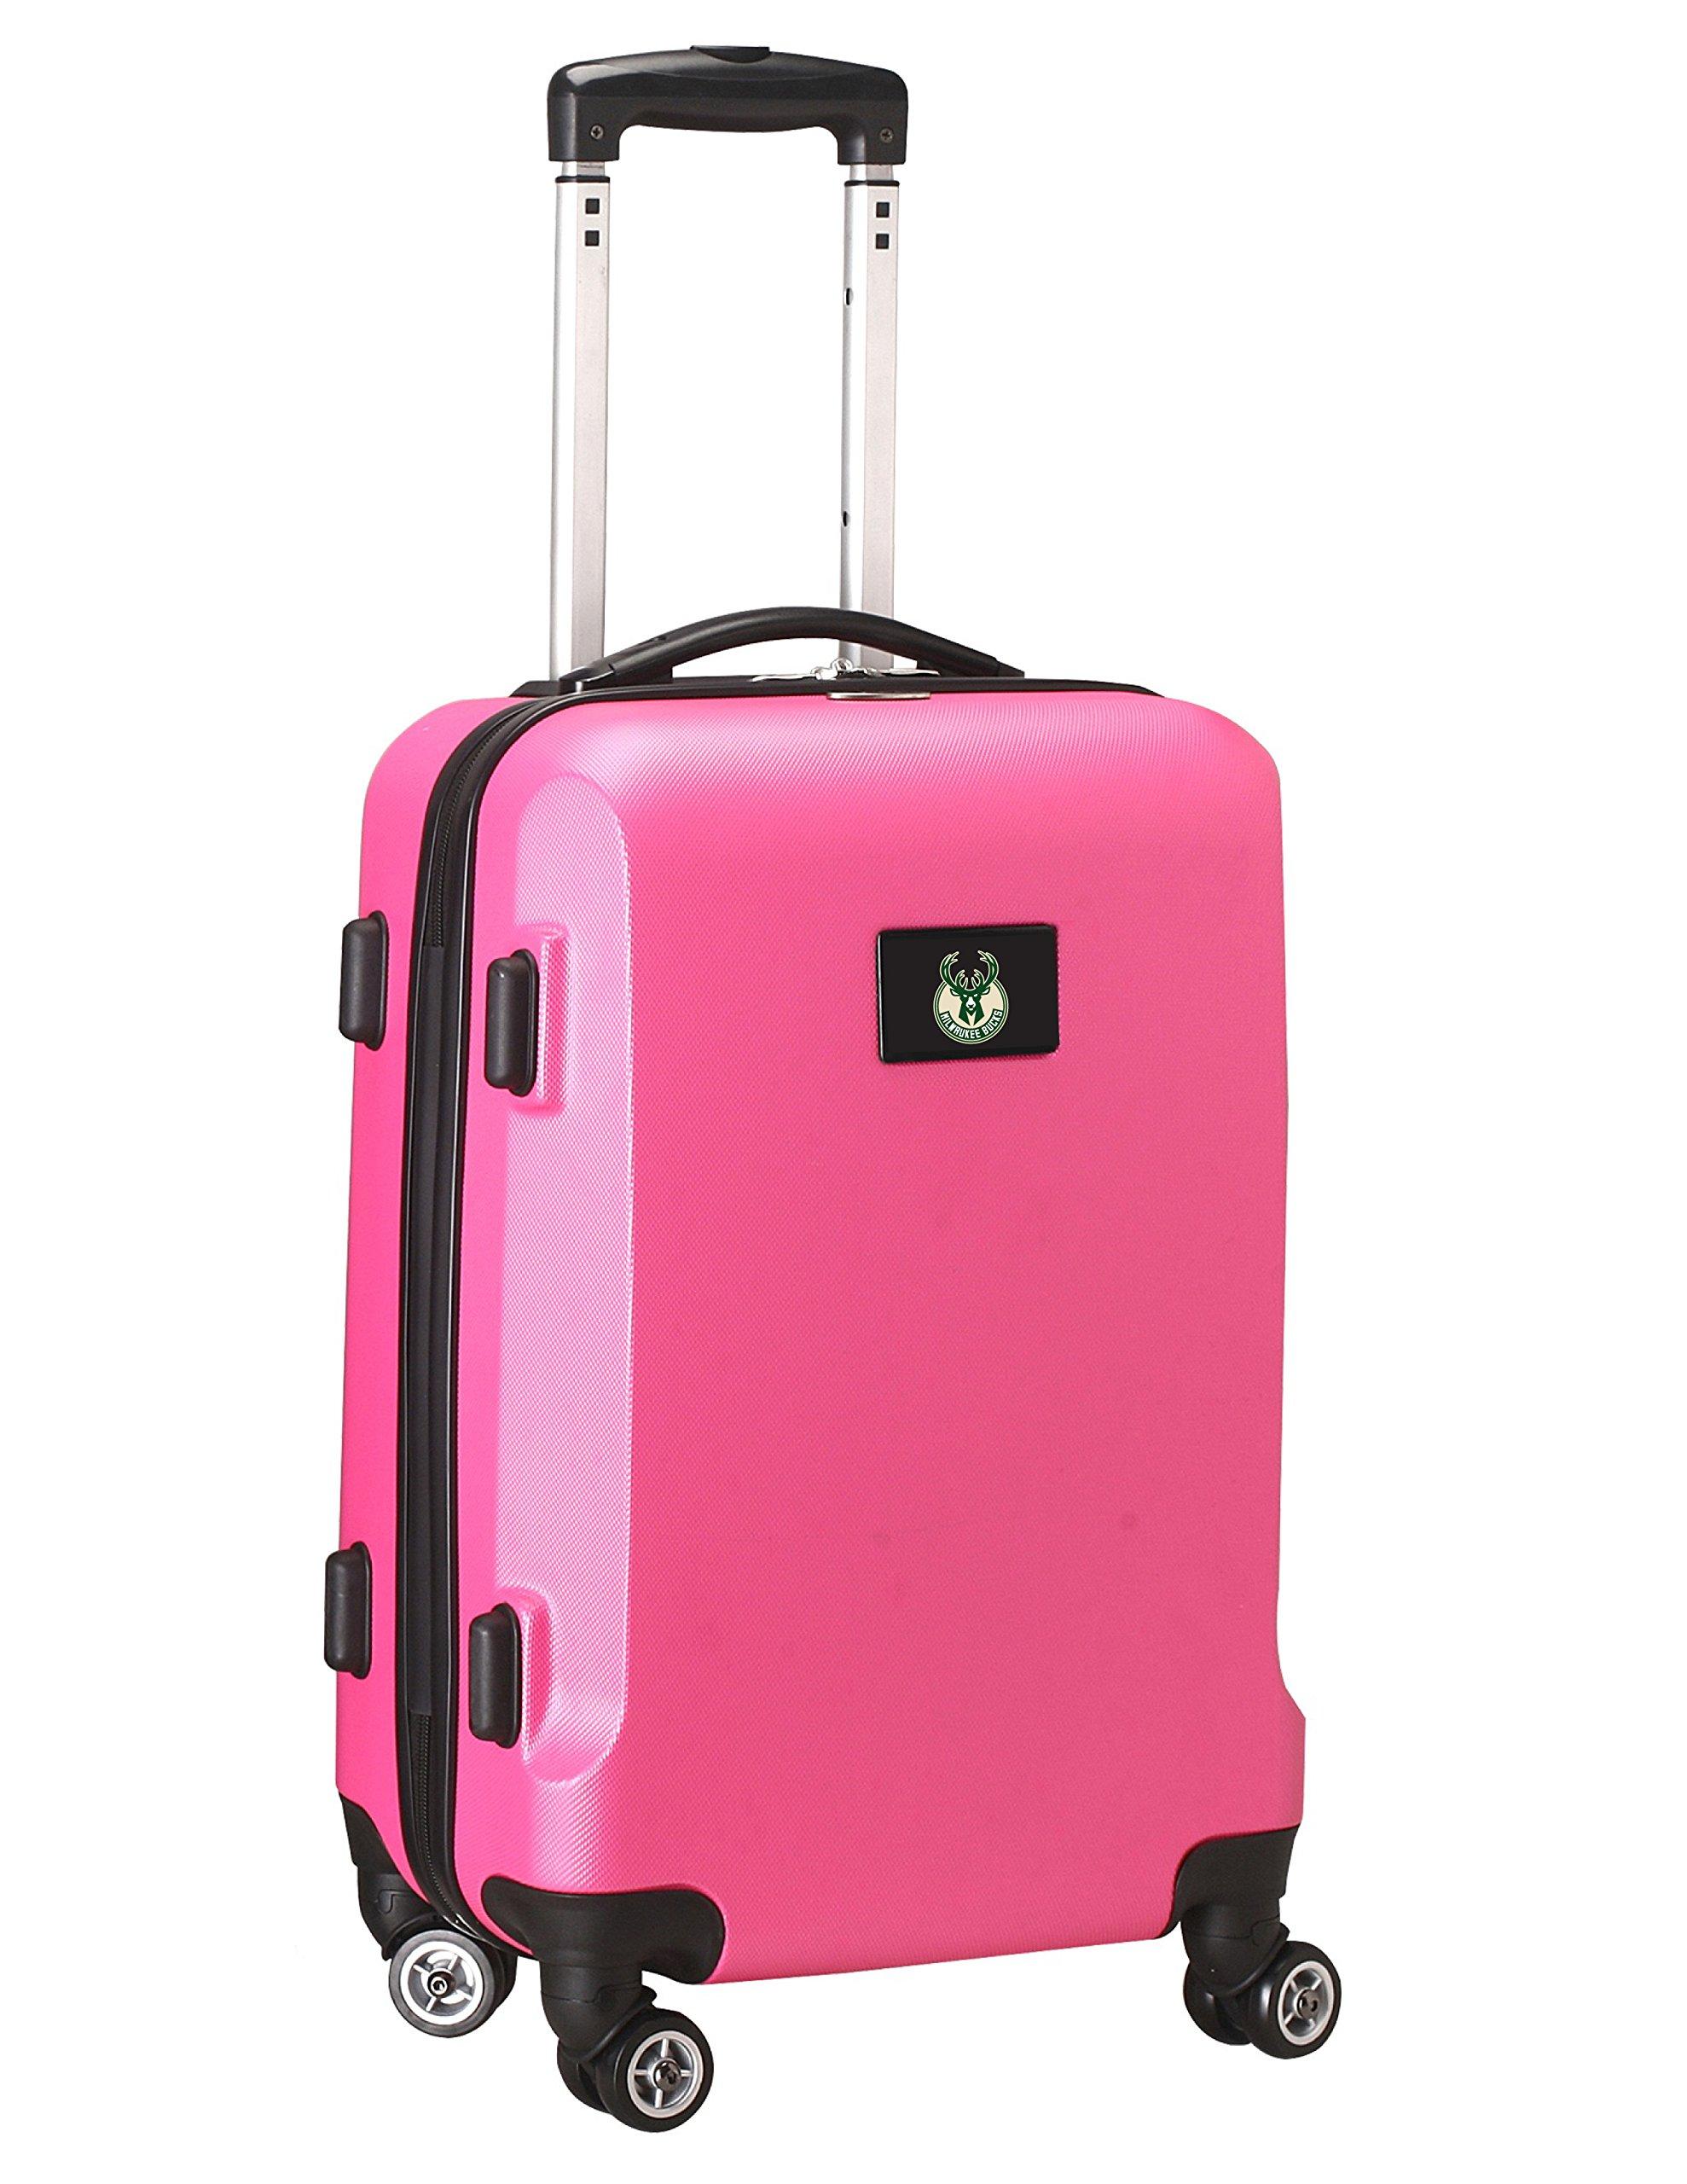 Denco NBA Milwaukee Bucks Carry-On Hardcase Luggage Spinner, Pink